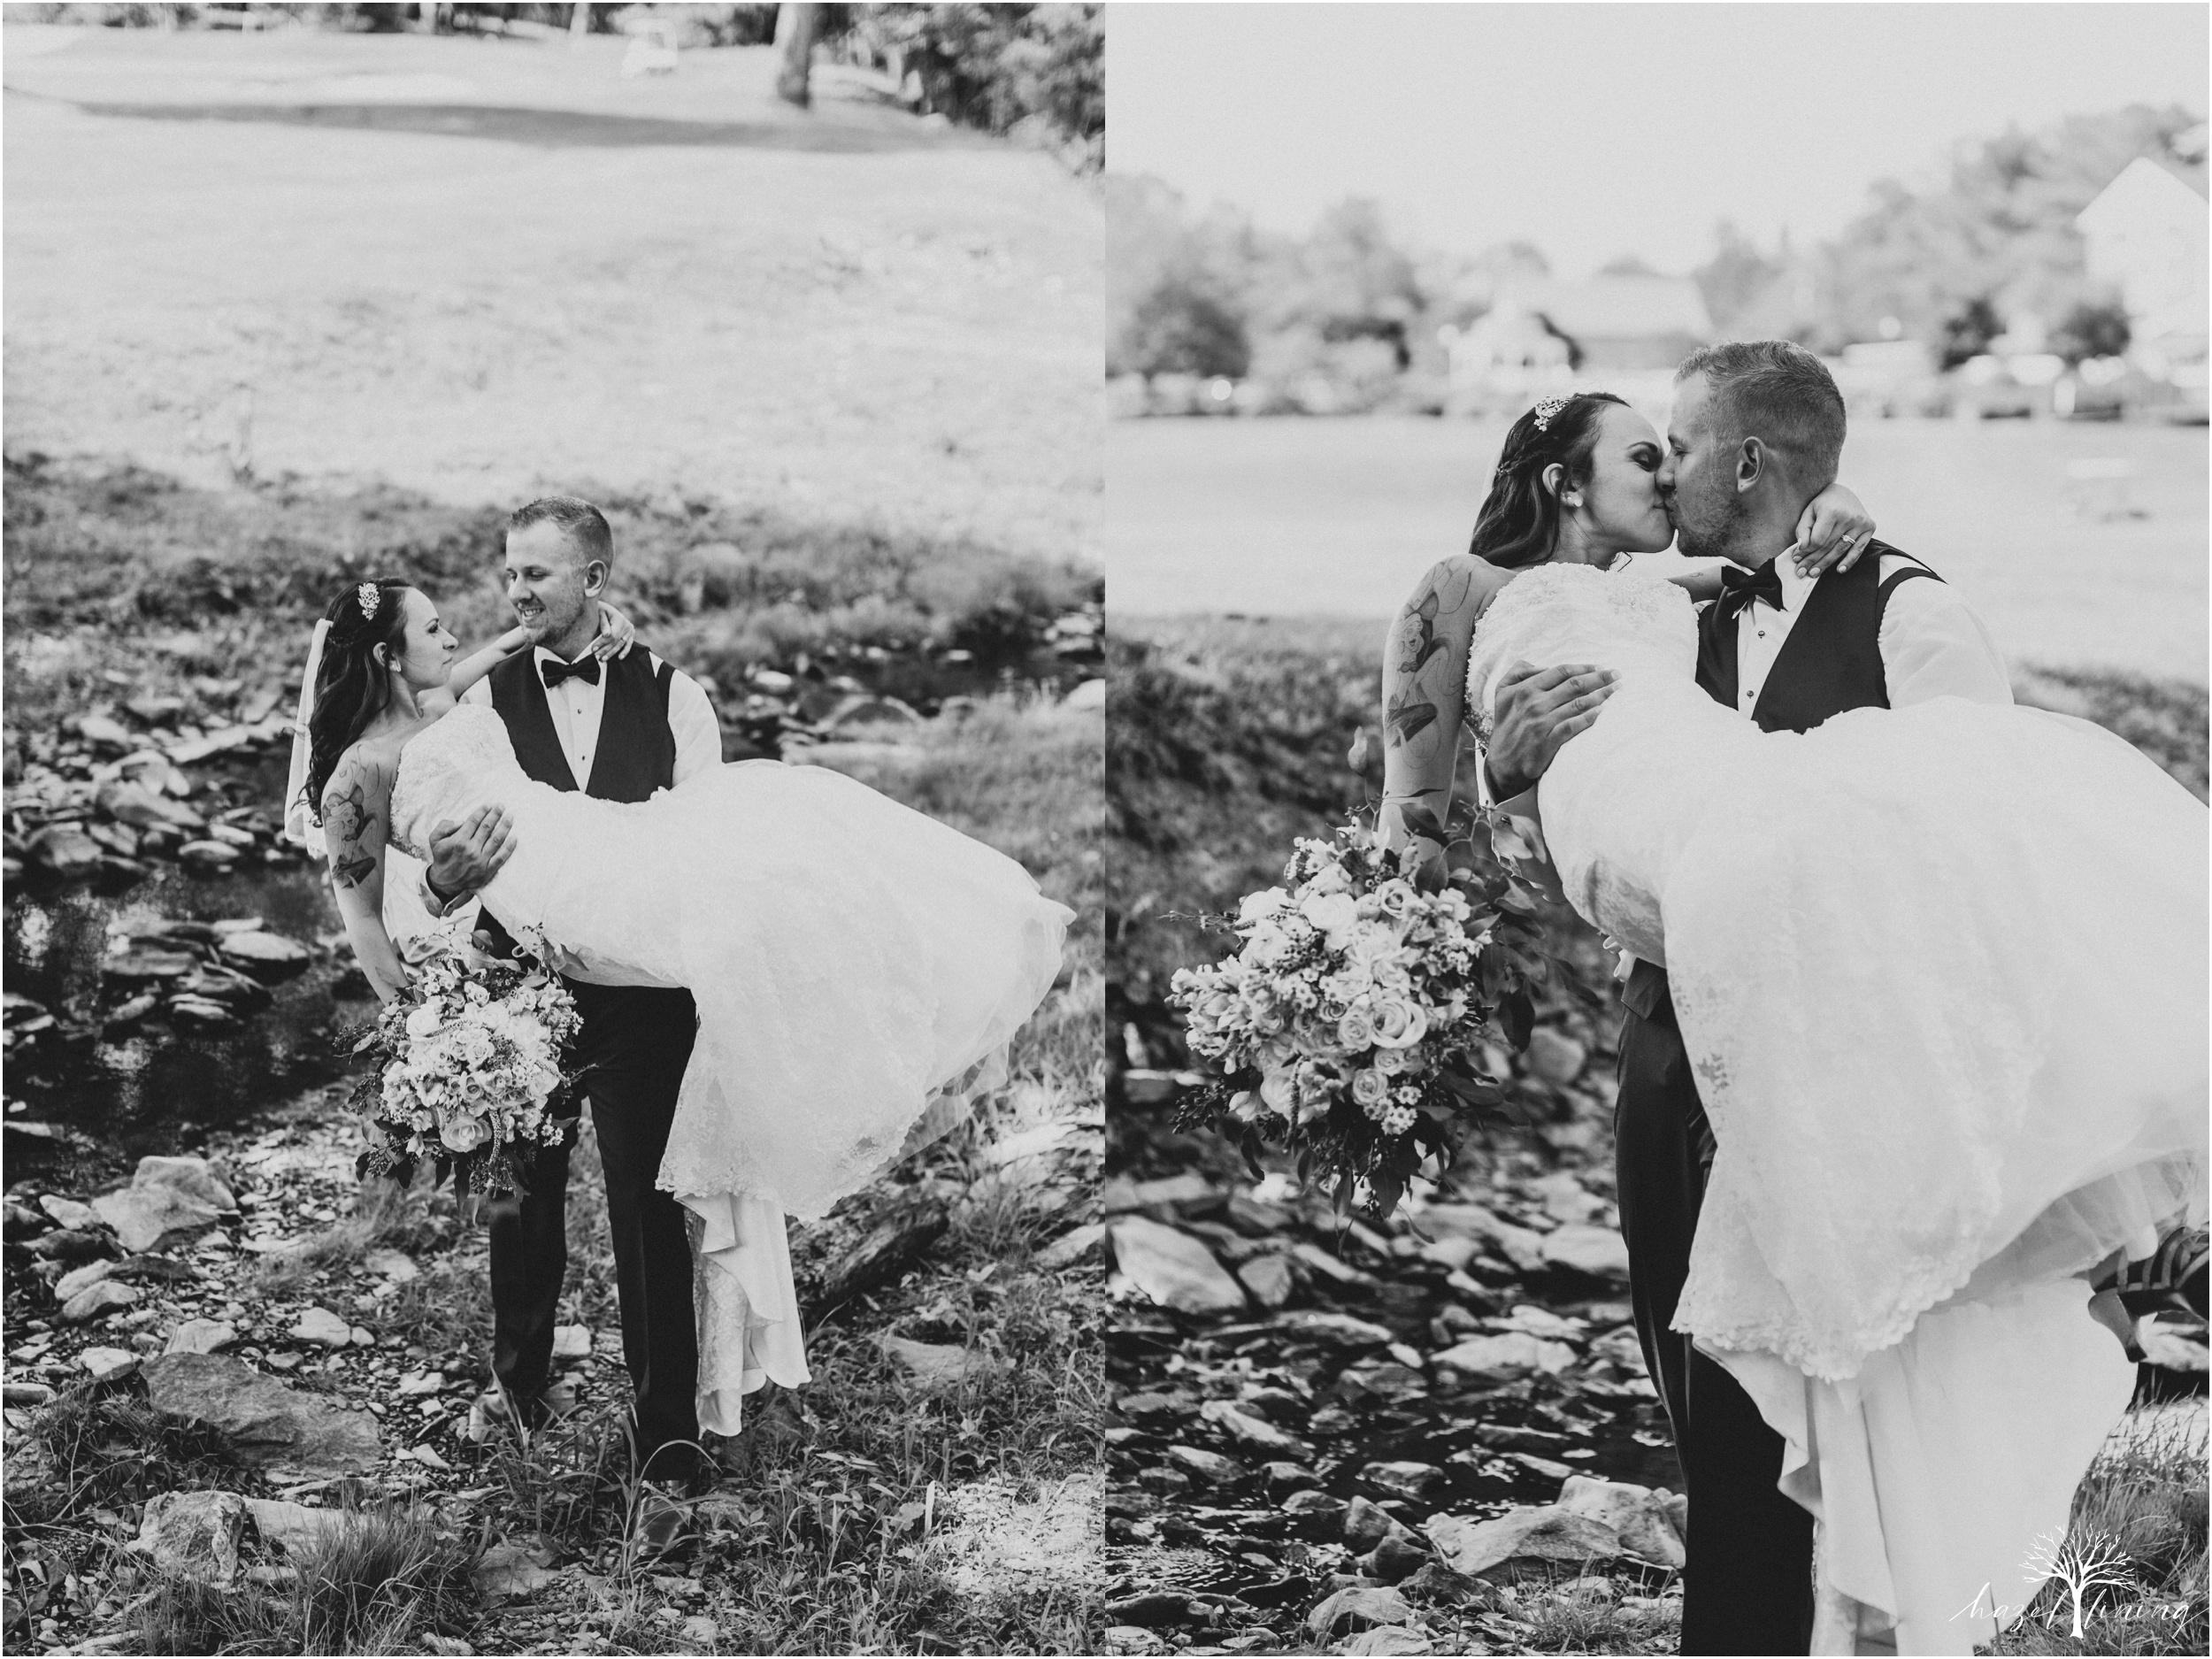 alyssa-james-stiteler-wedding-loft-and-sweet-water-cc-pennsburg-pennsylvania-hazel-lining-travel-wedding-elopement-photography_0096.jpg